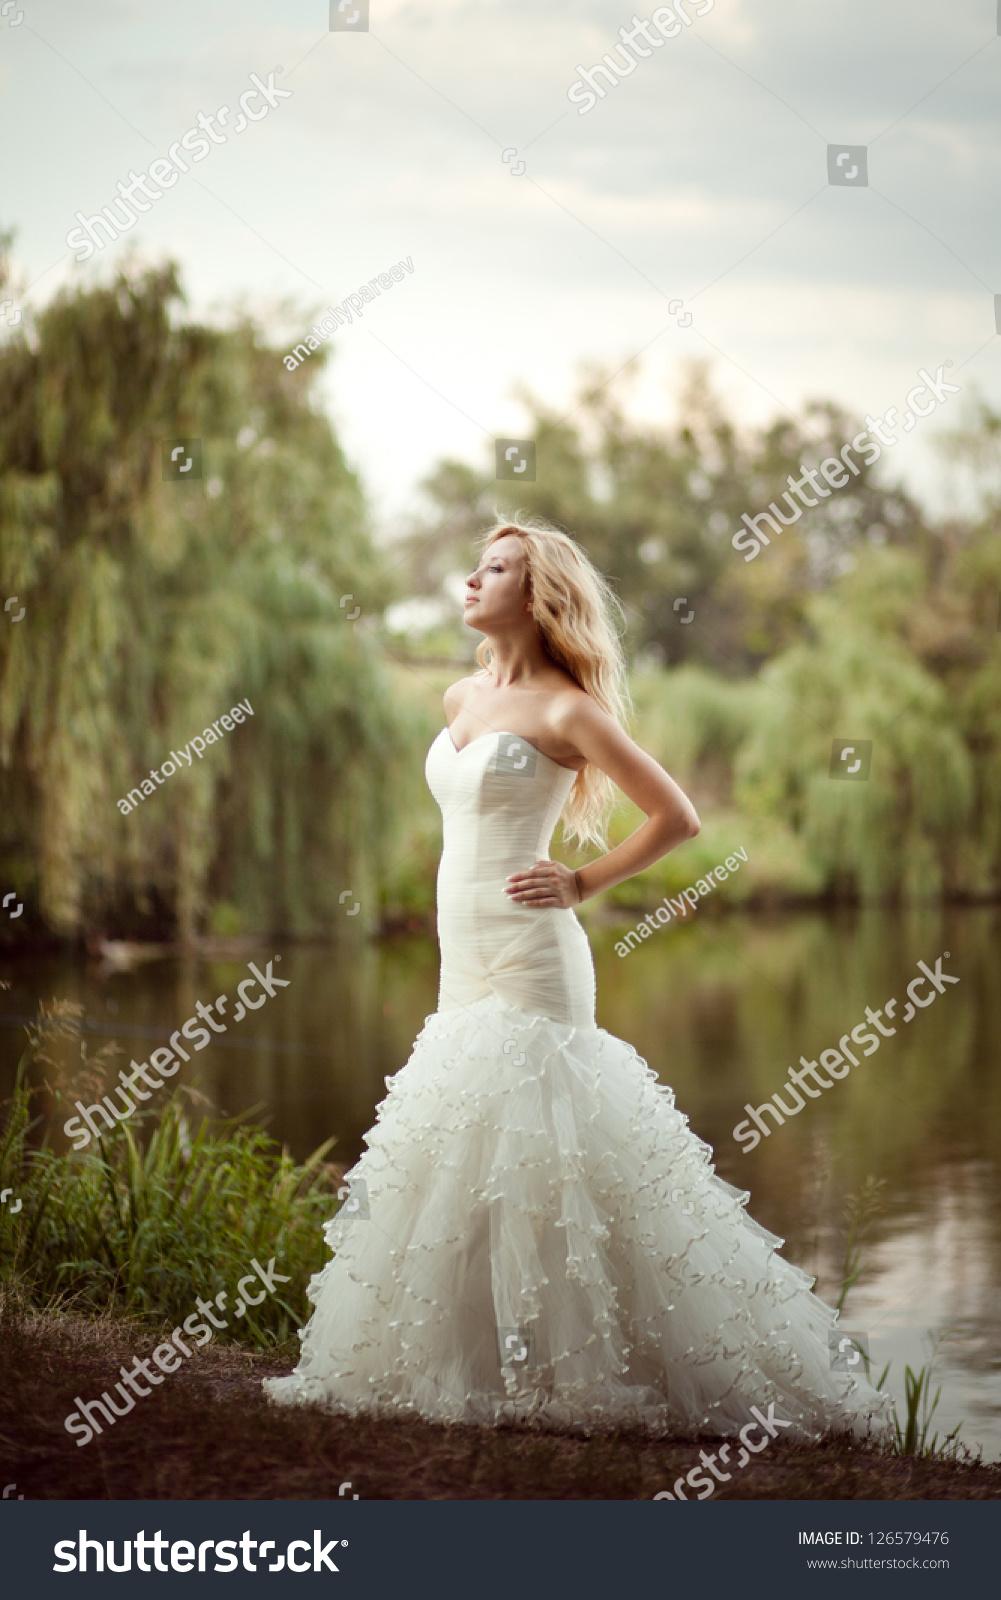 A Beautiful Colorado Wedding Awaits ...